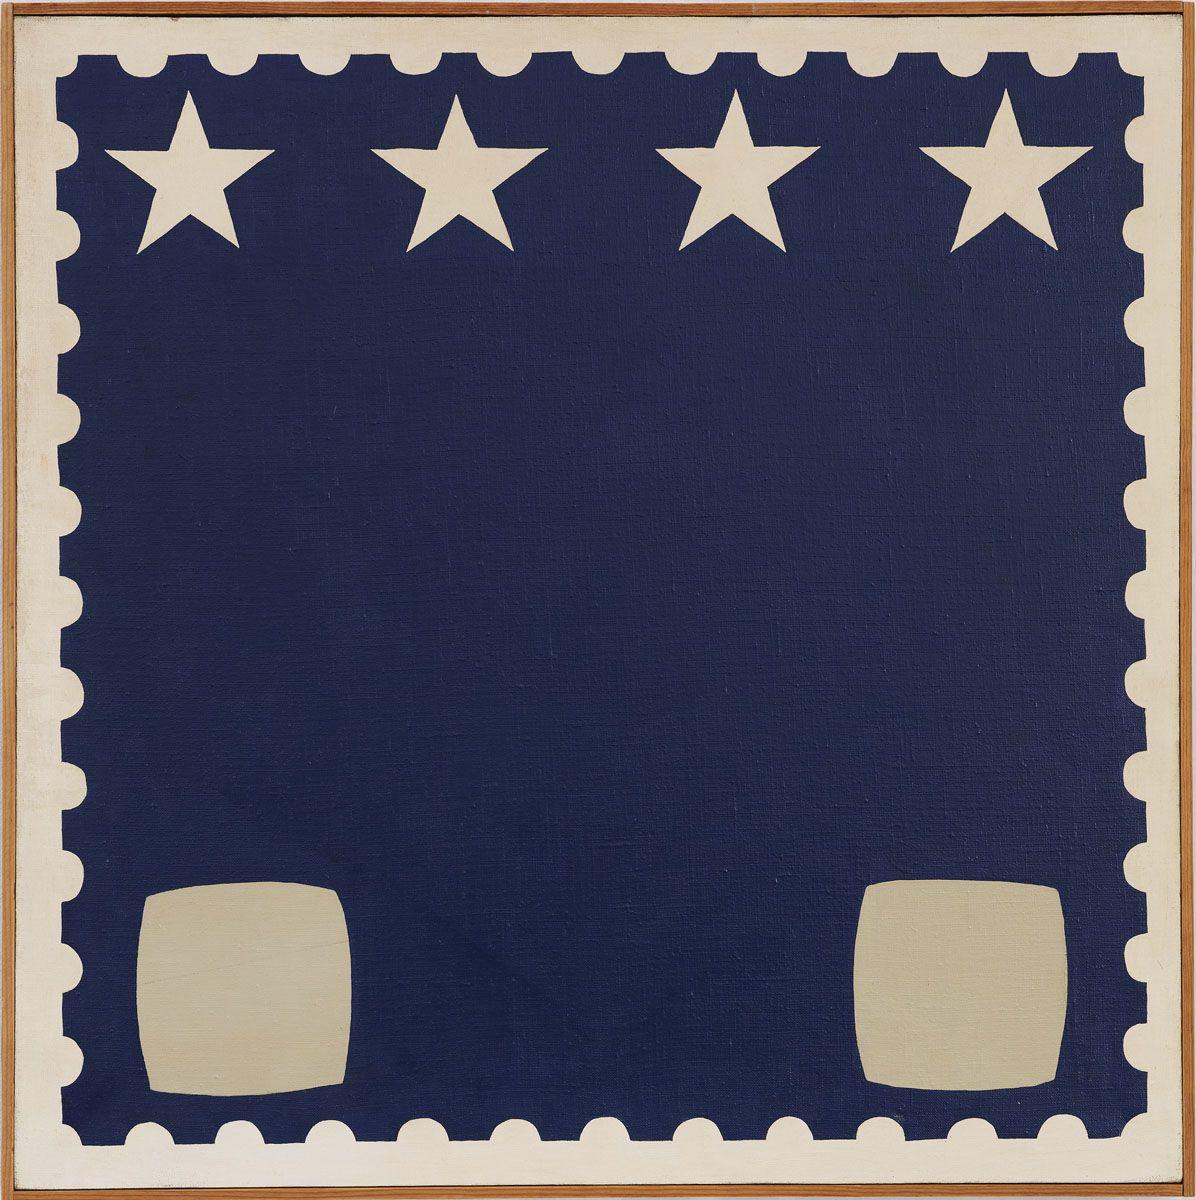 JOHN WESLEY, Stamp,1961